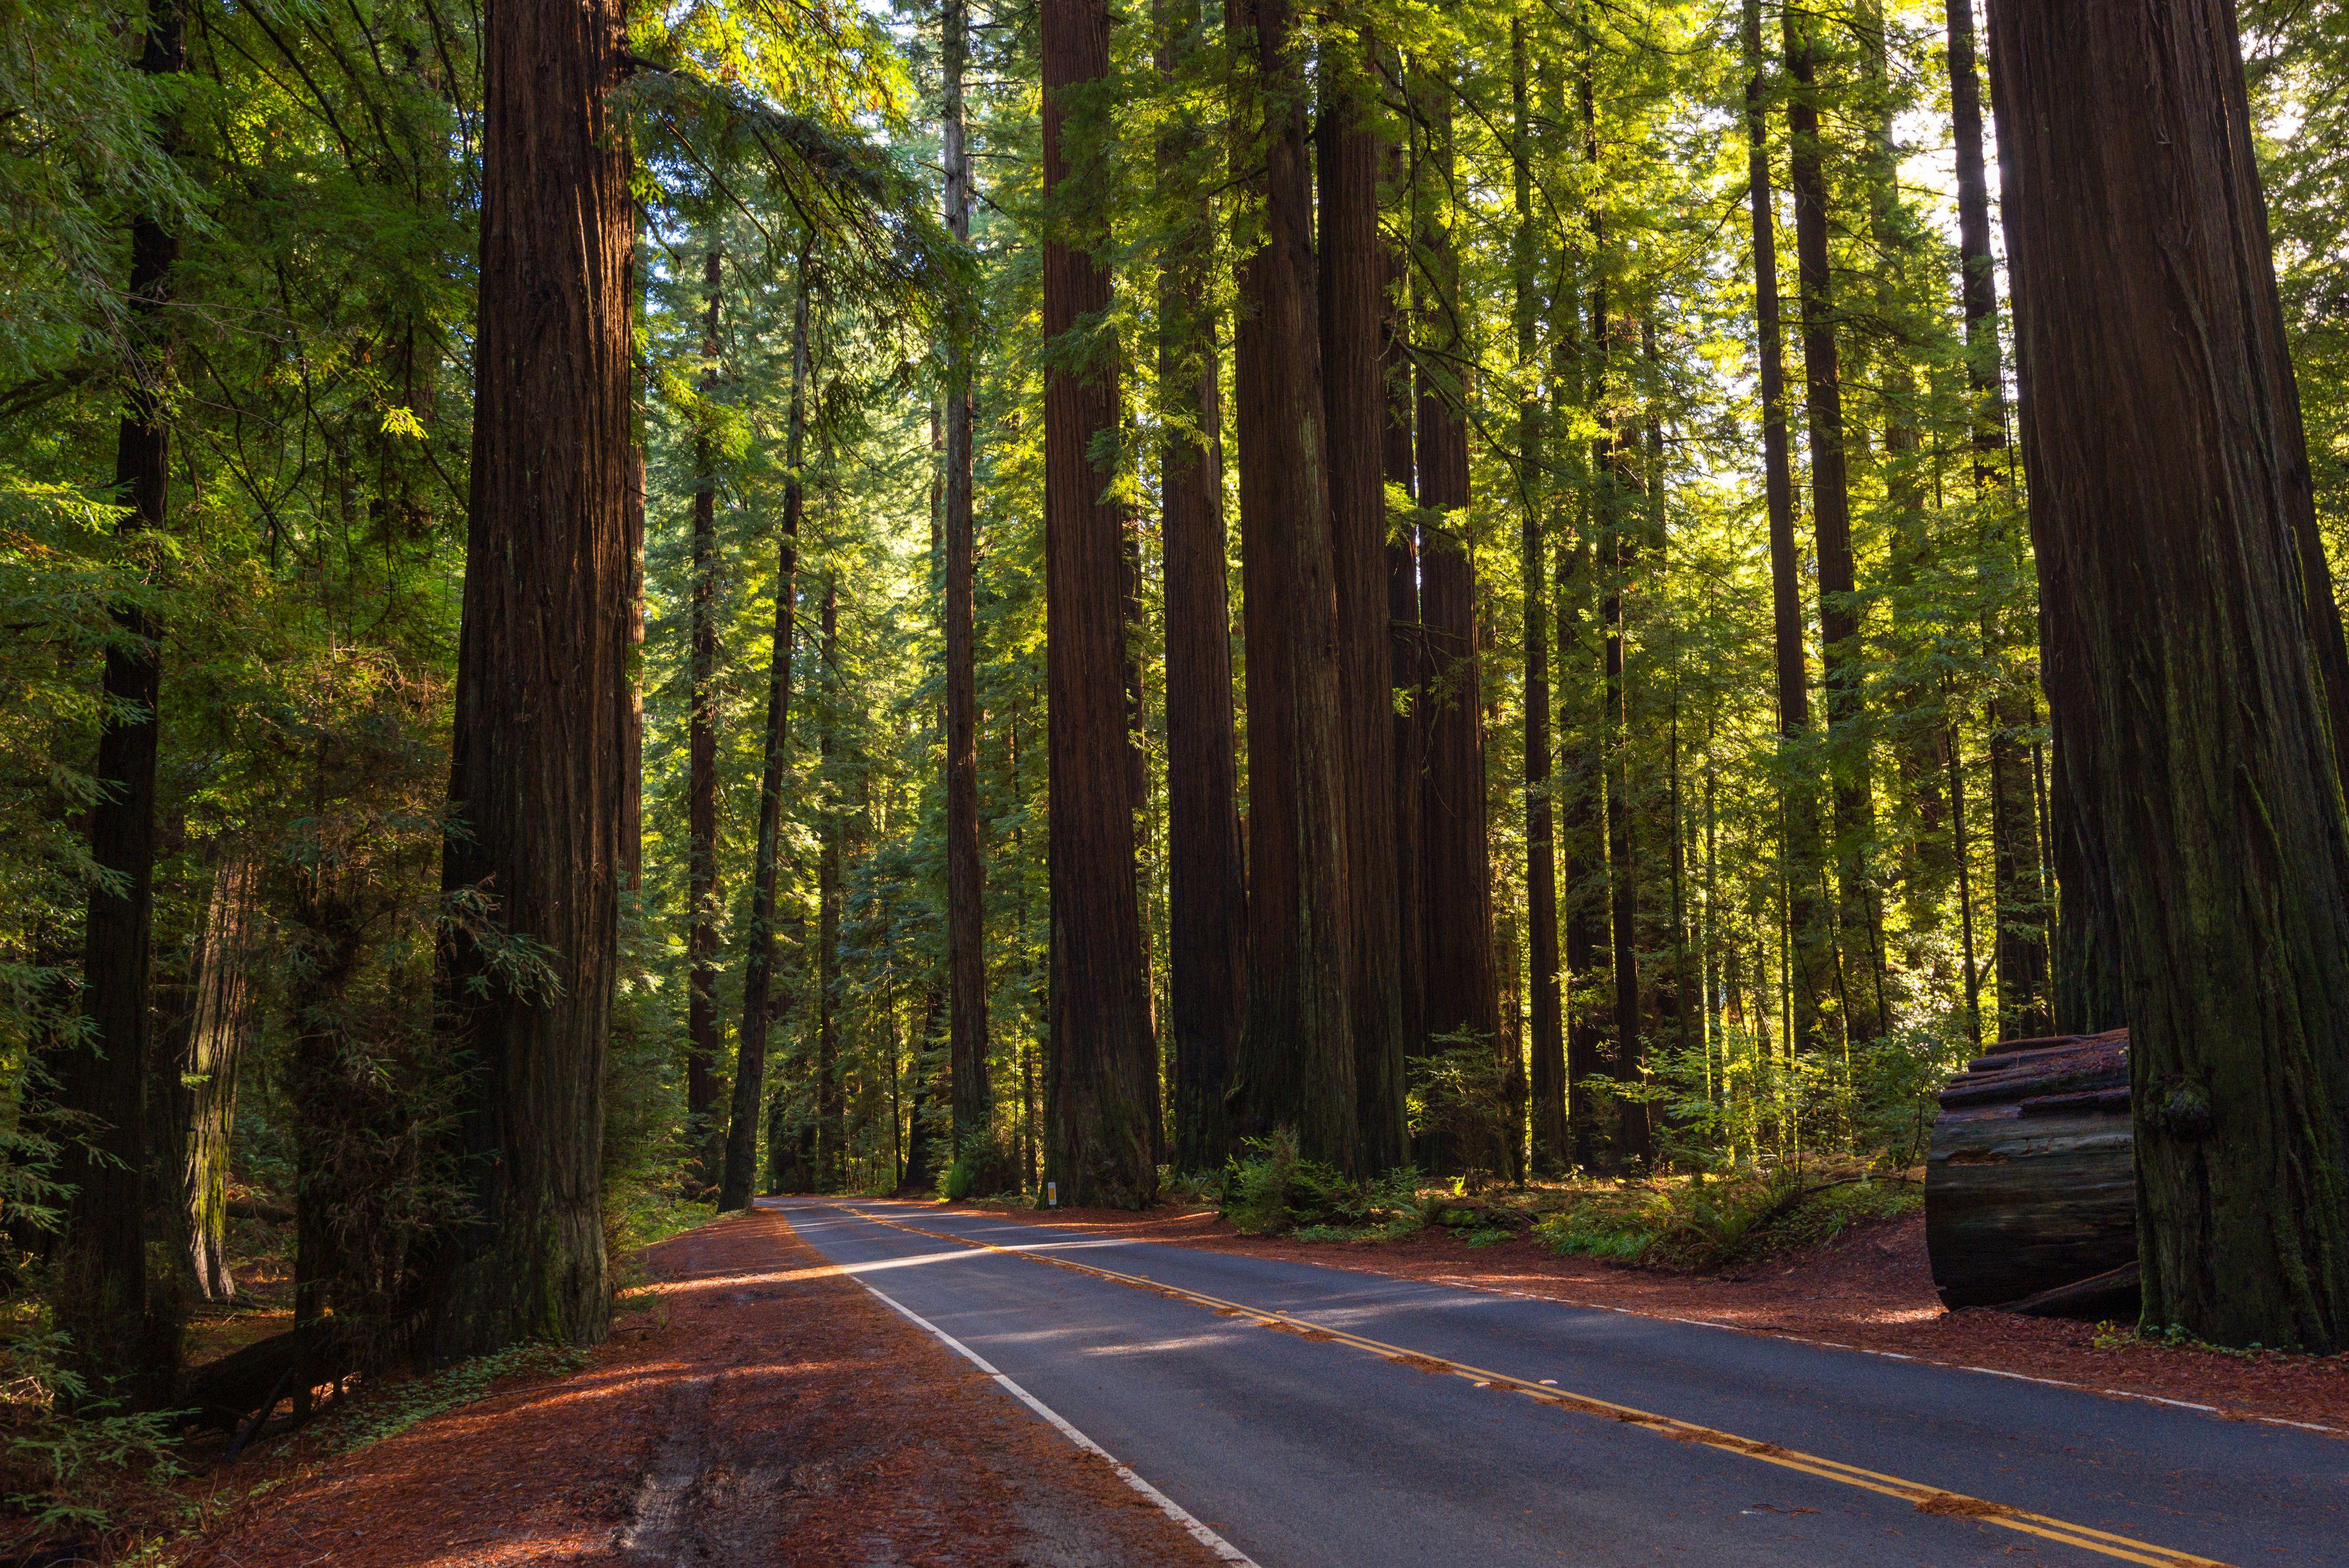 Avenue of giant redwood California